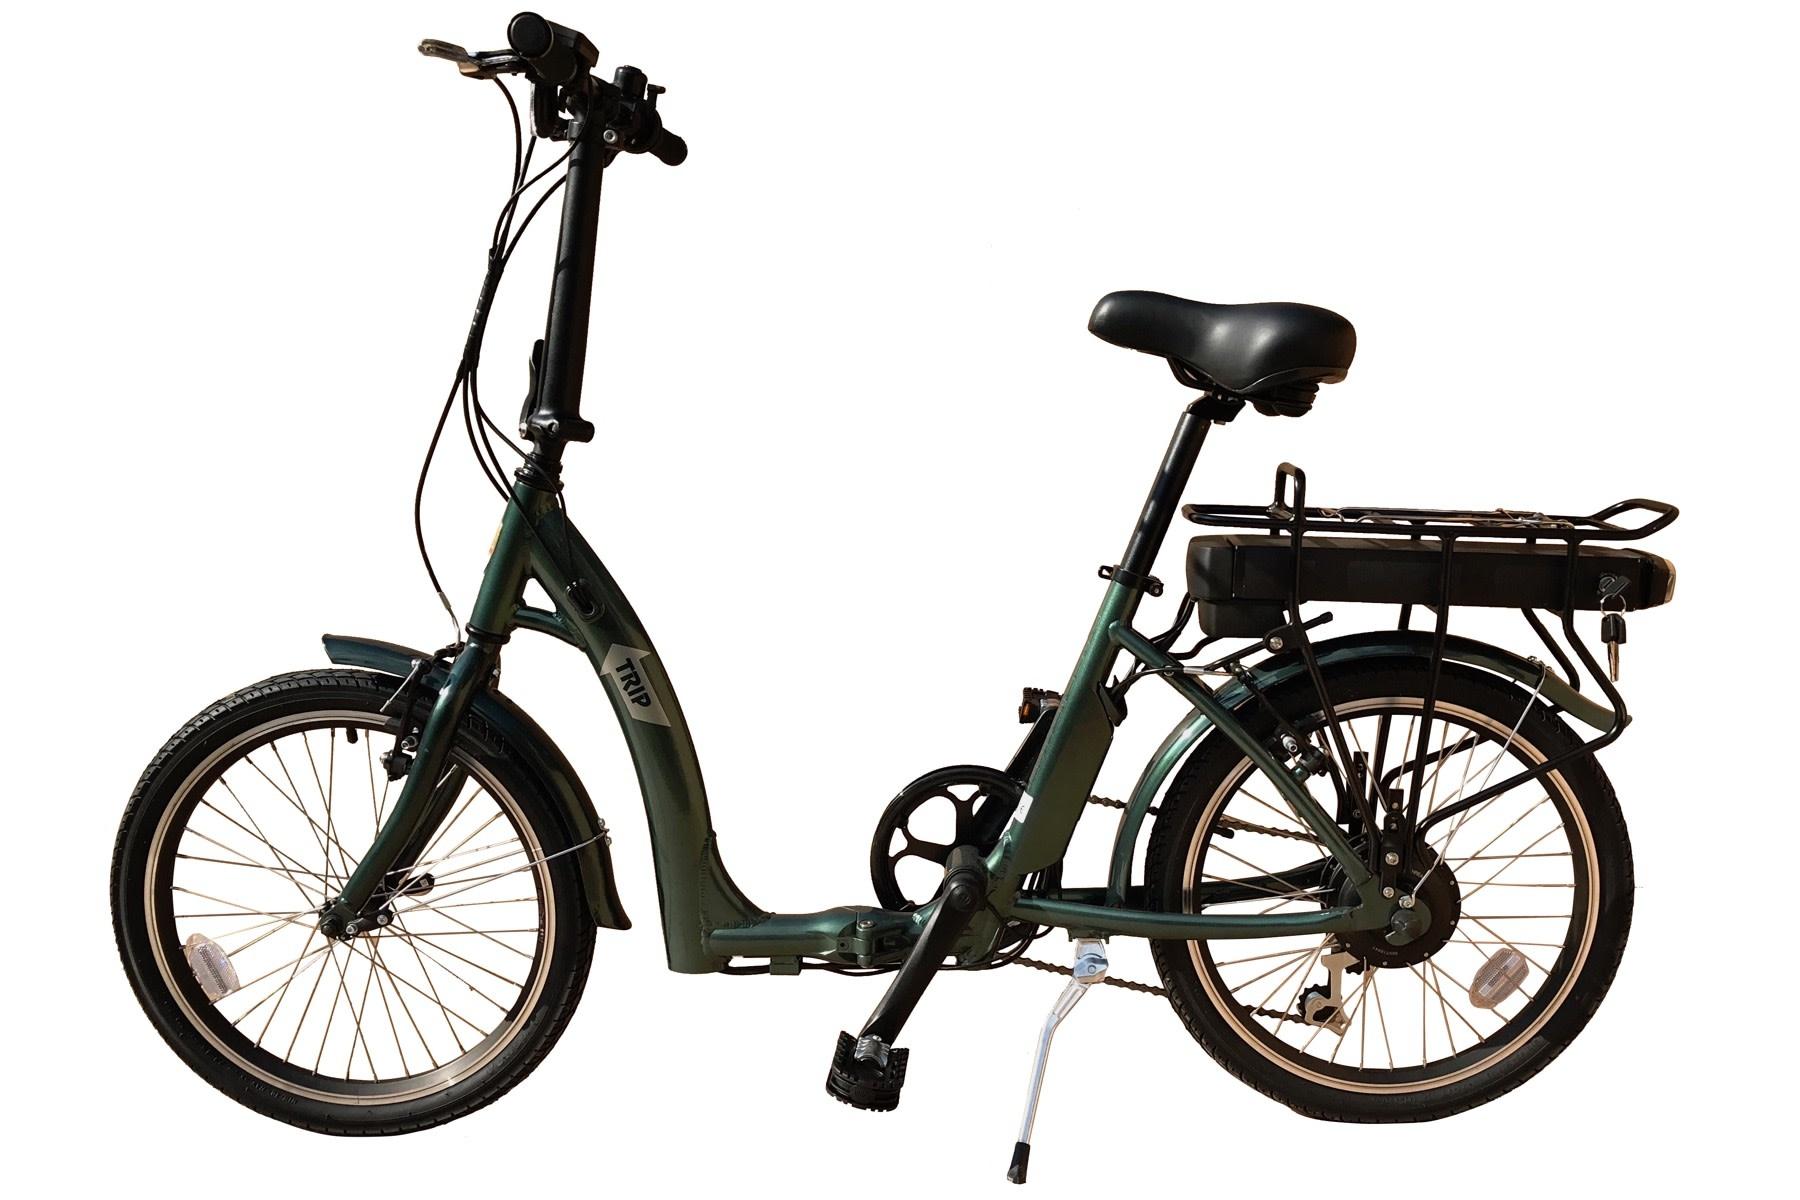 "BatriBike BatriBike Trip Folding eBike 20"" wheel - 8.8 AH Battery - Green"